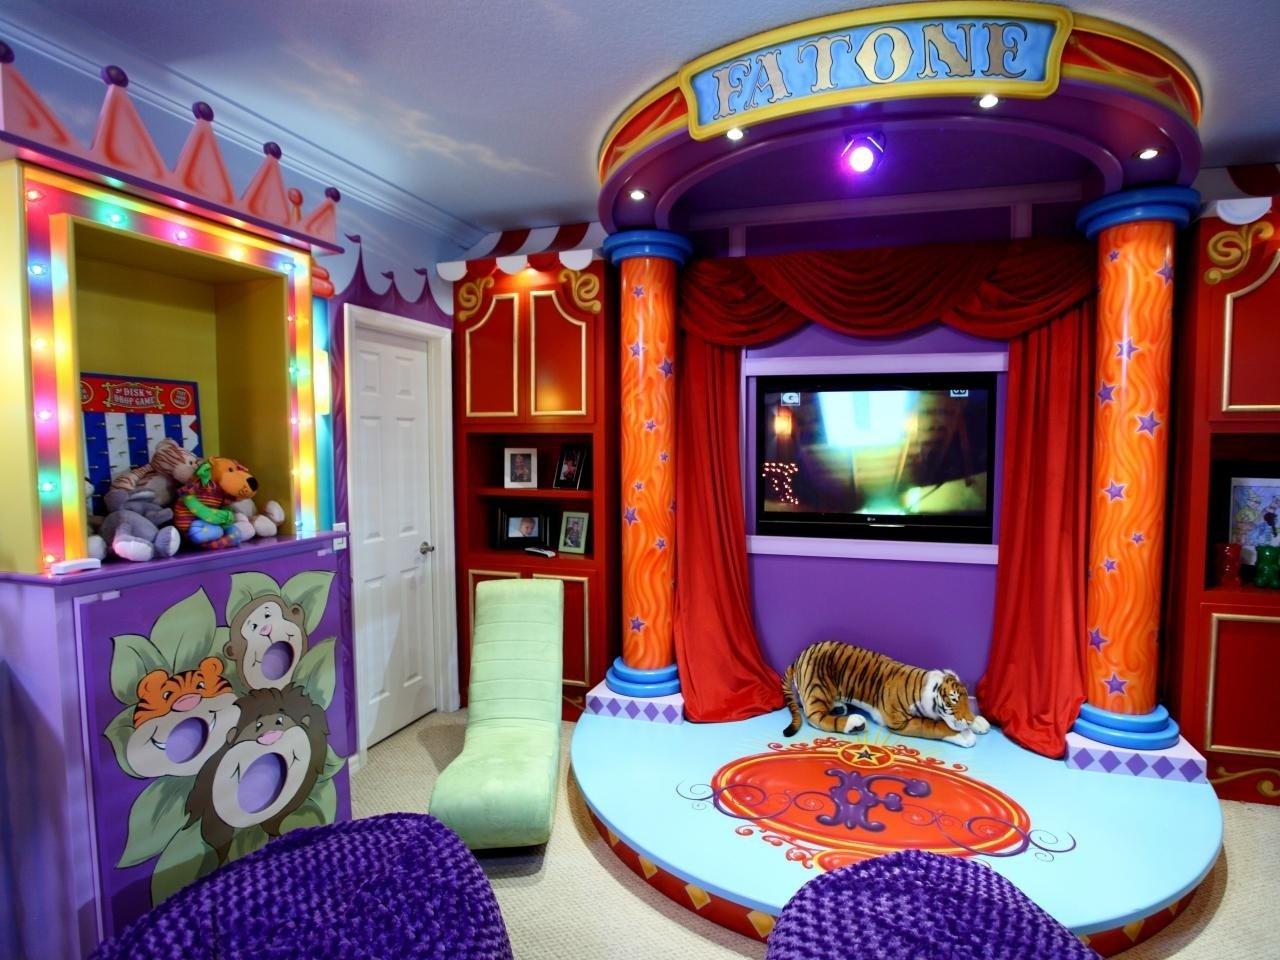 10 Cute Fun In The Bedroom Ideas bedroom winsome fun bedroom ideas stylish bedroom cozy bedroom 2020